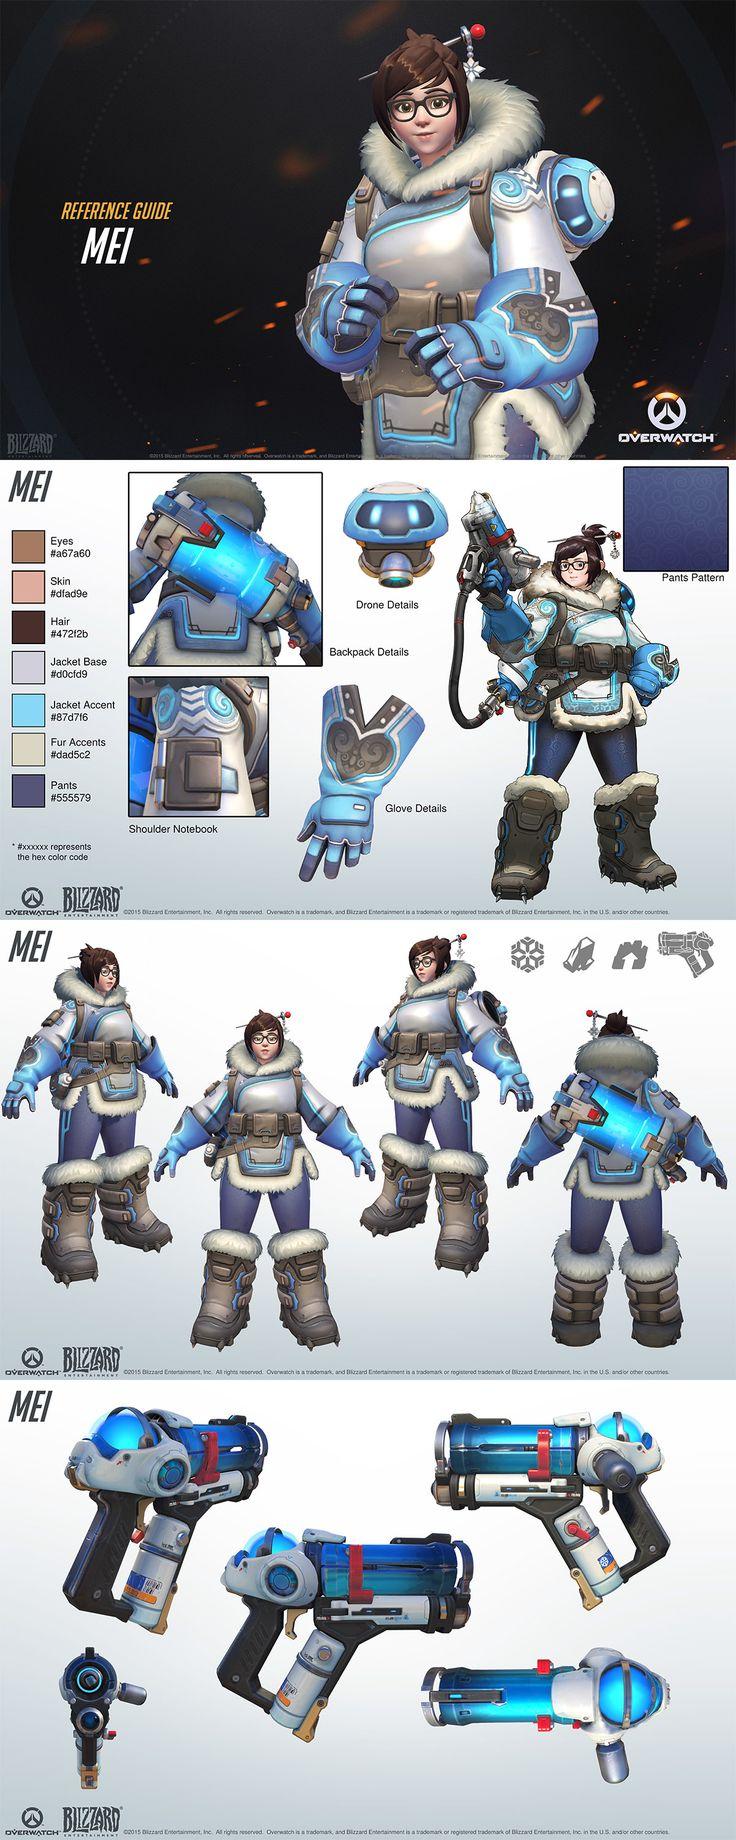 Overwatch character Mei